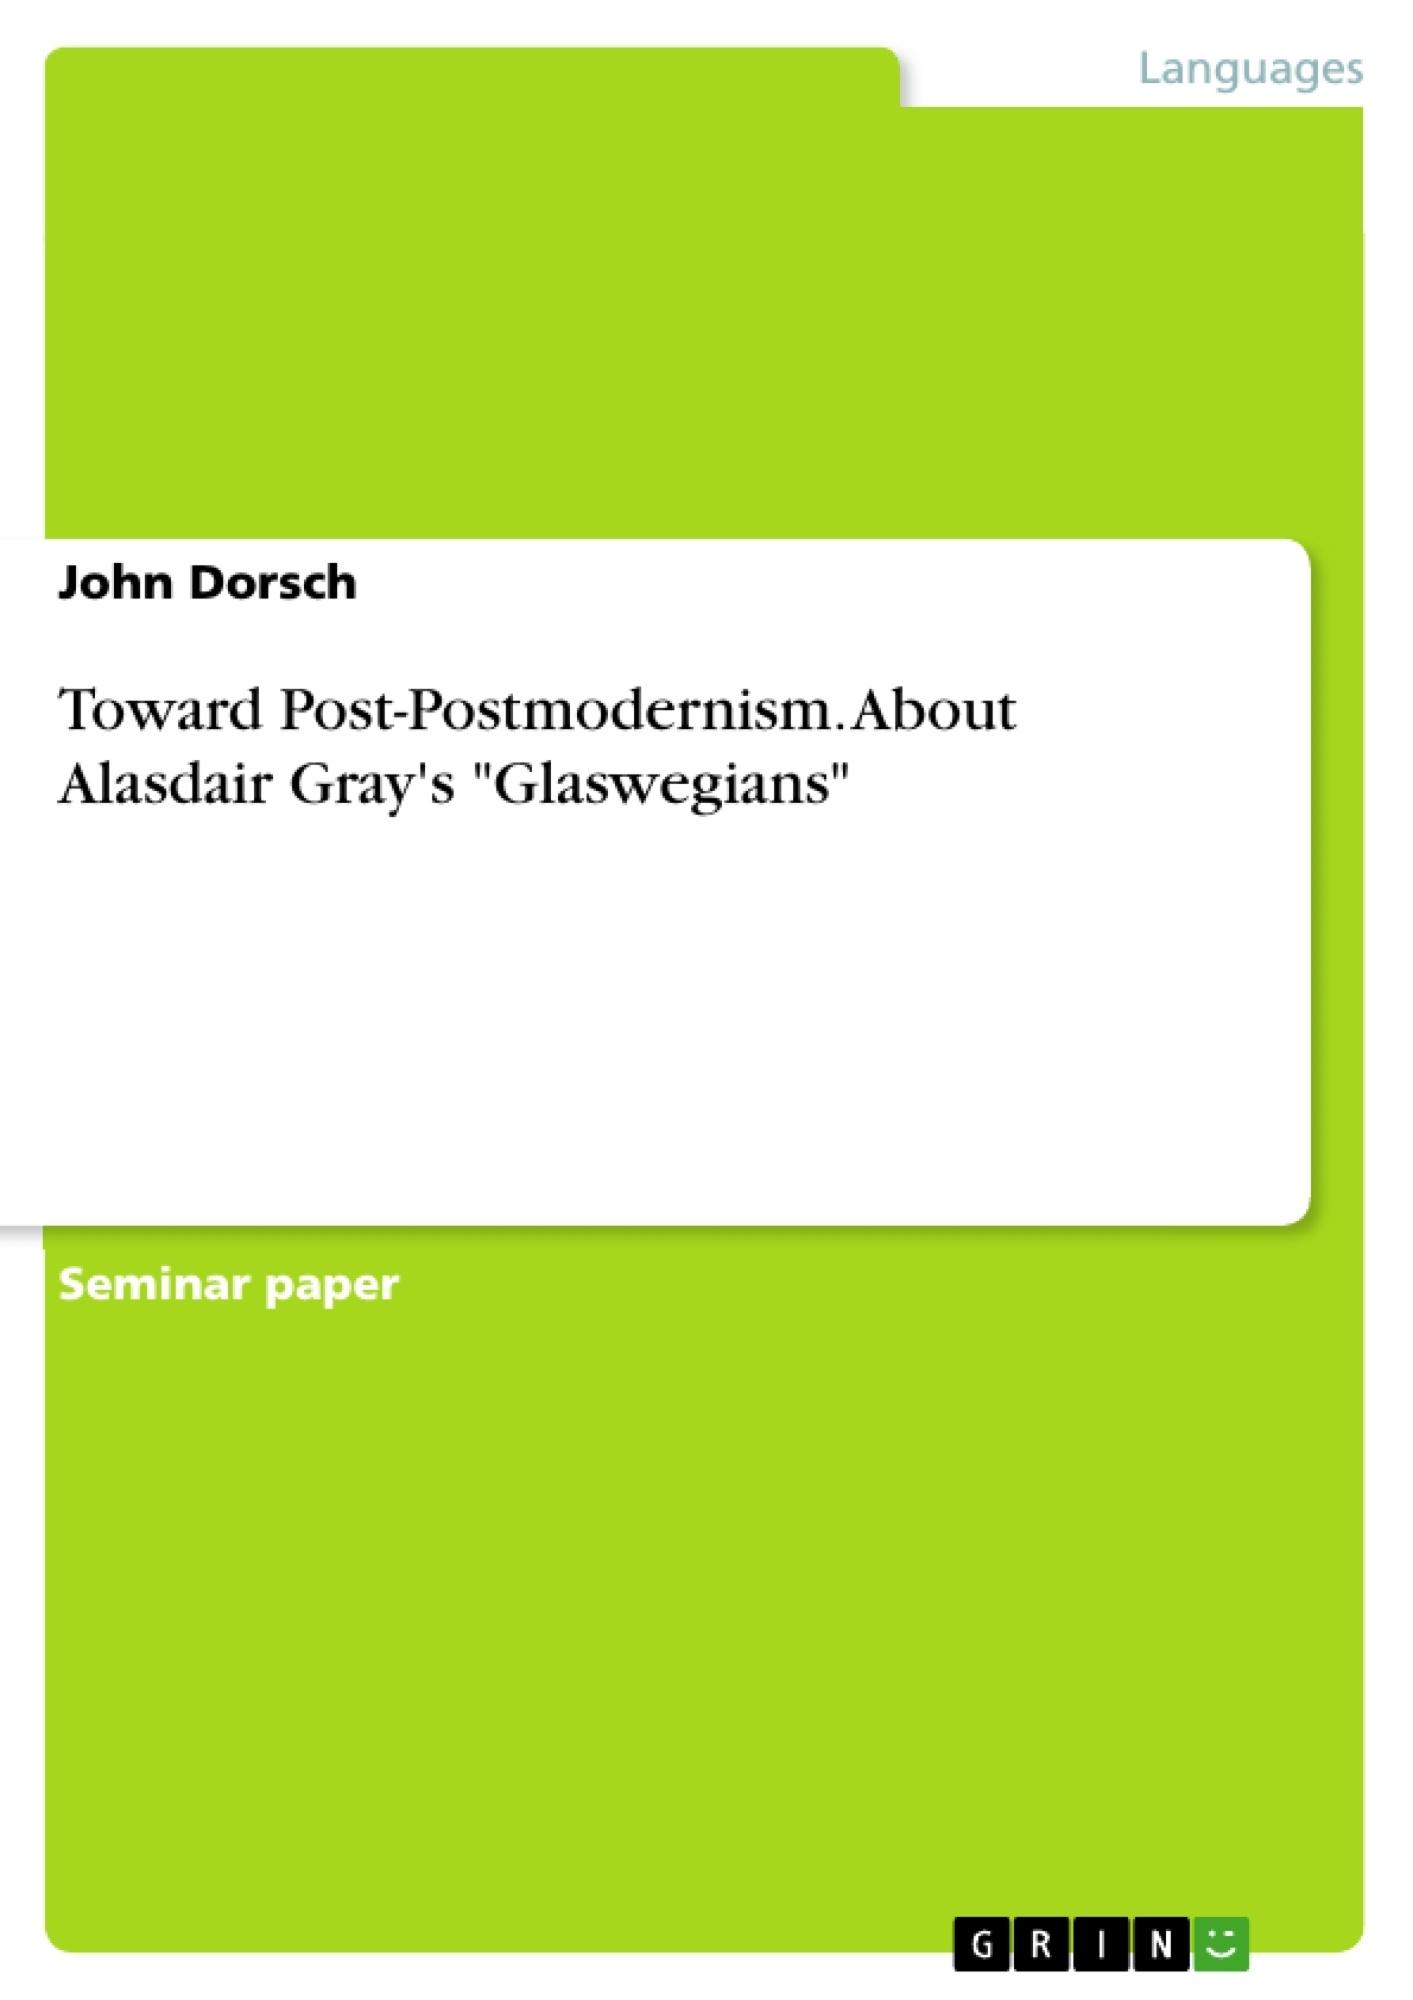 "Title: Toward Post-Postmodernism. About Alasdair Gray's ""Glaswegians"""